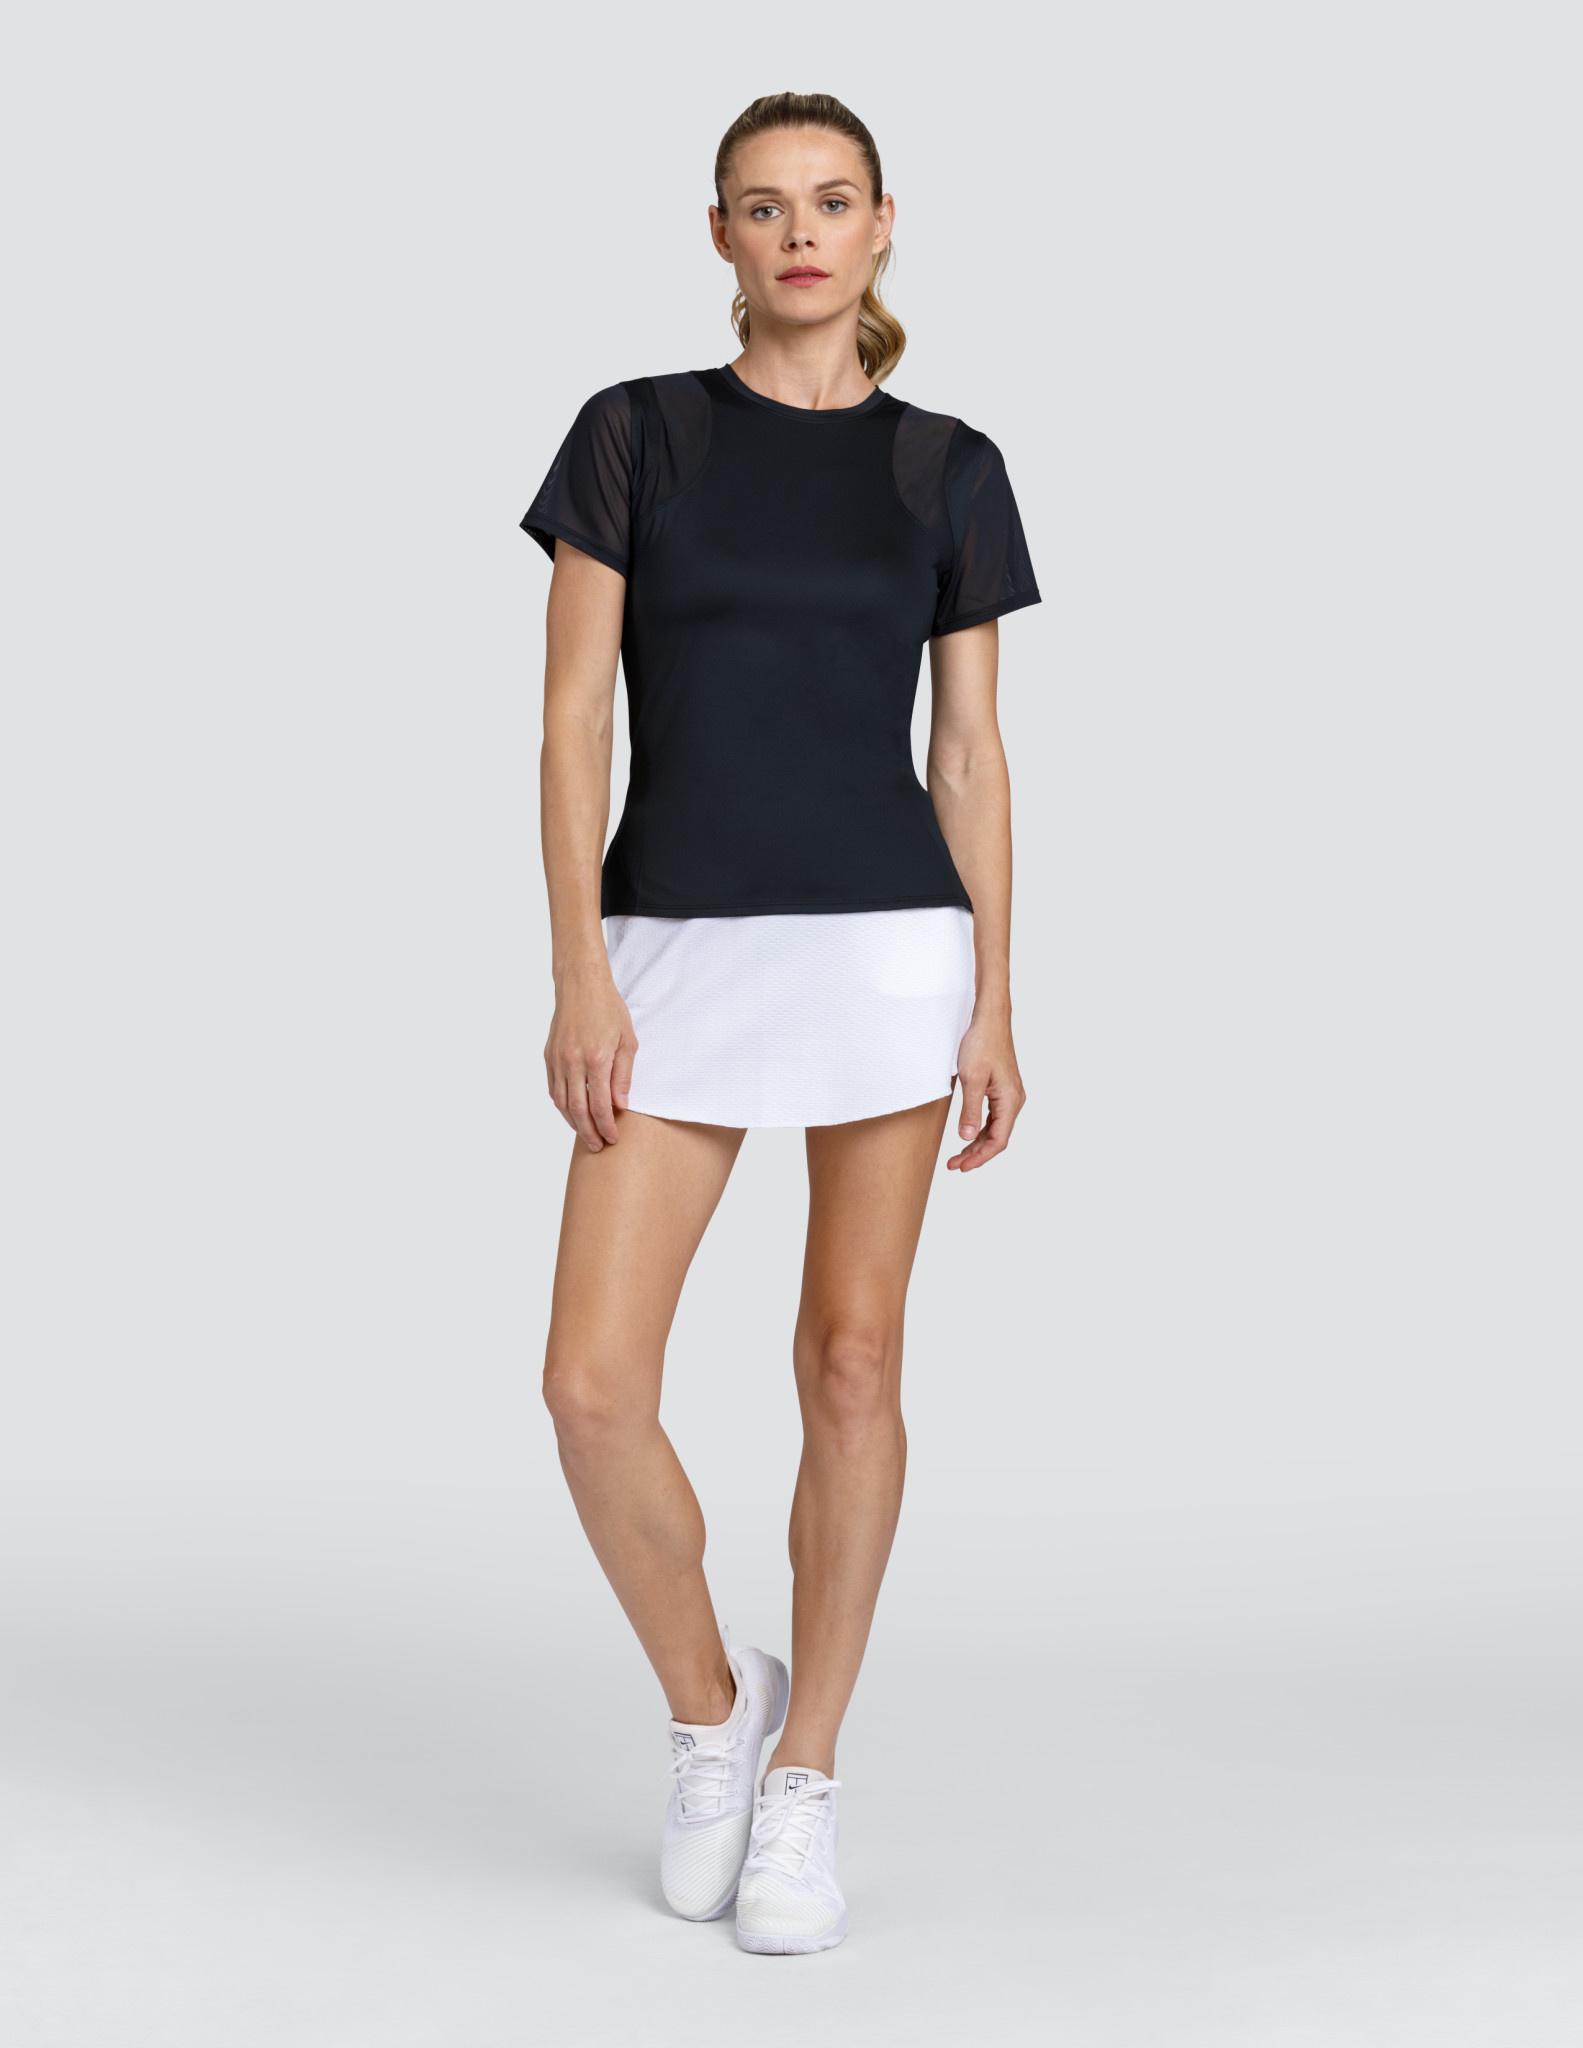 Tail Tennis Tail Nevaeh Short Sleeve Top Onyx